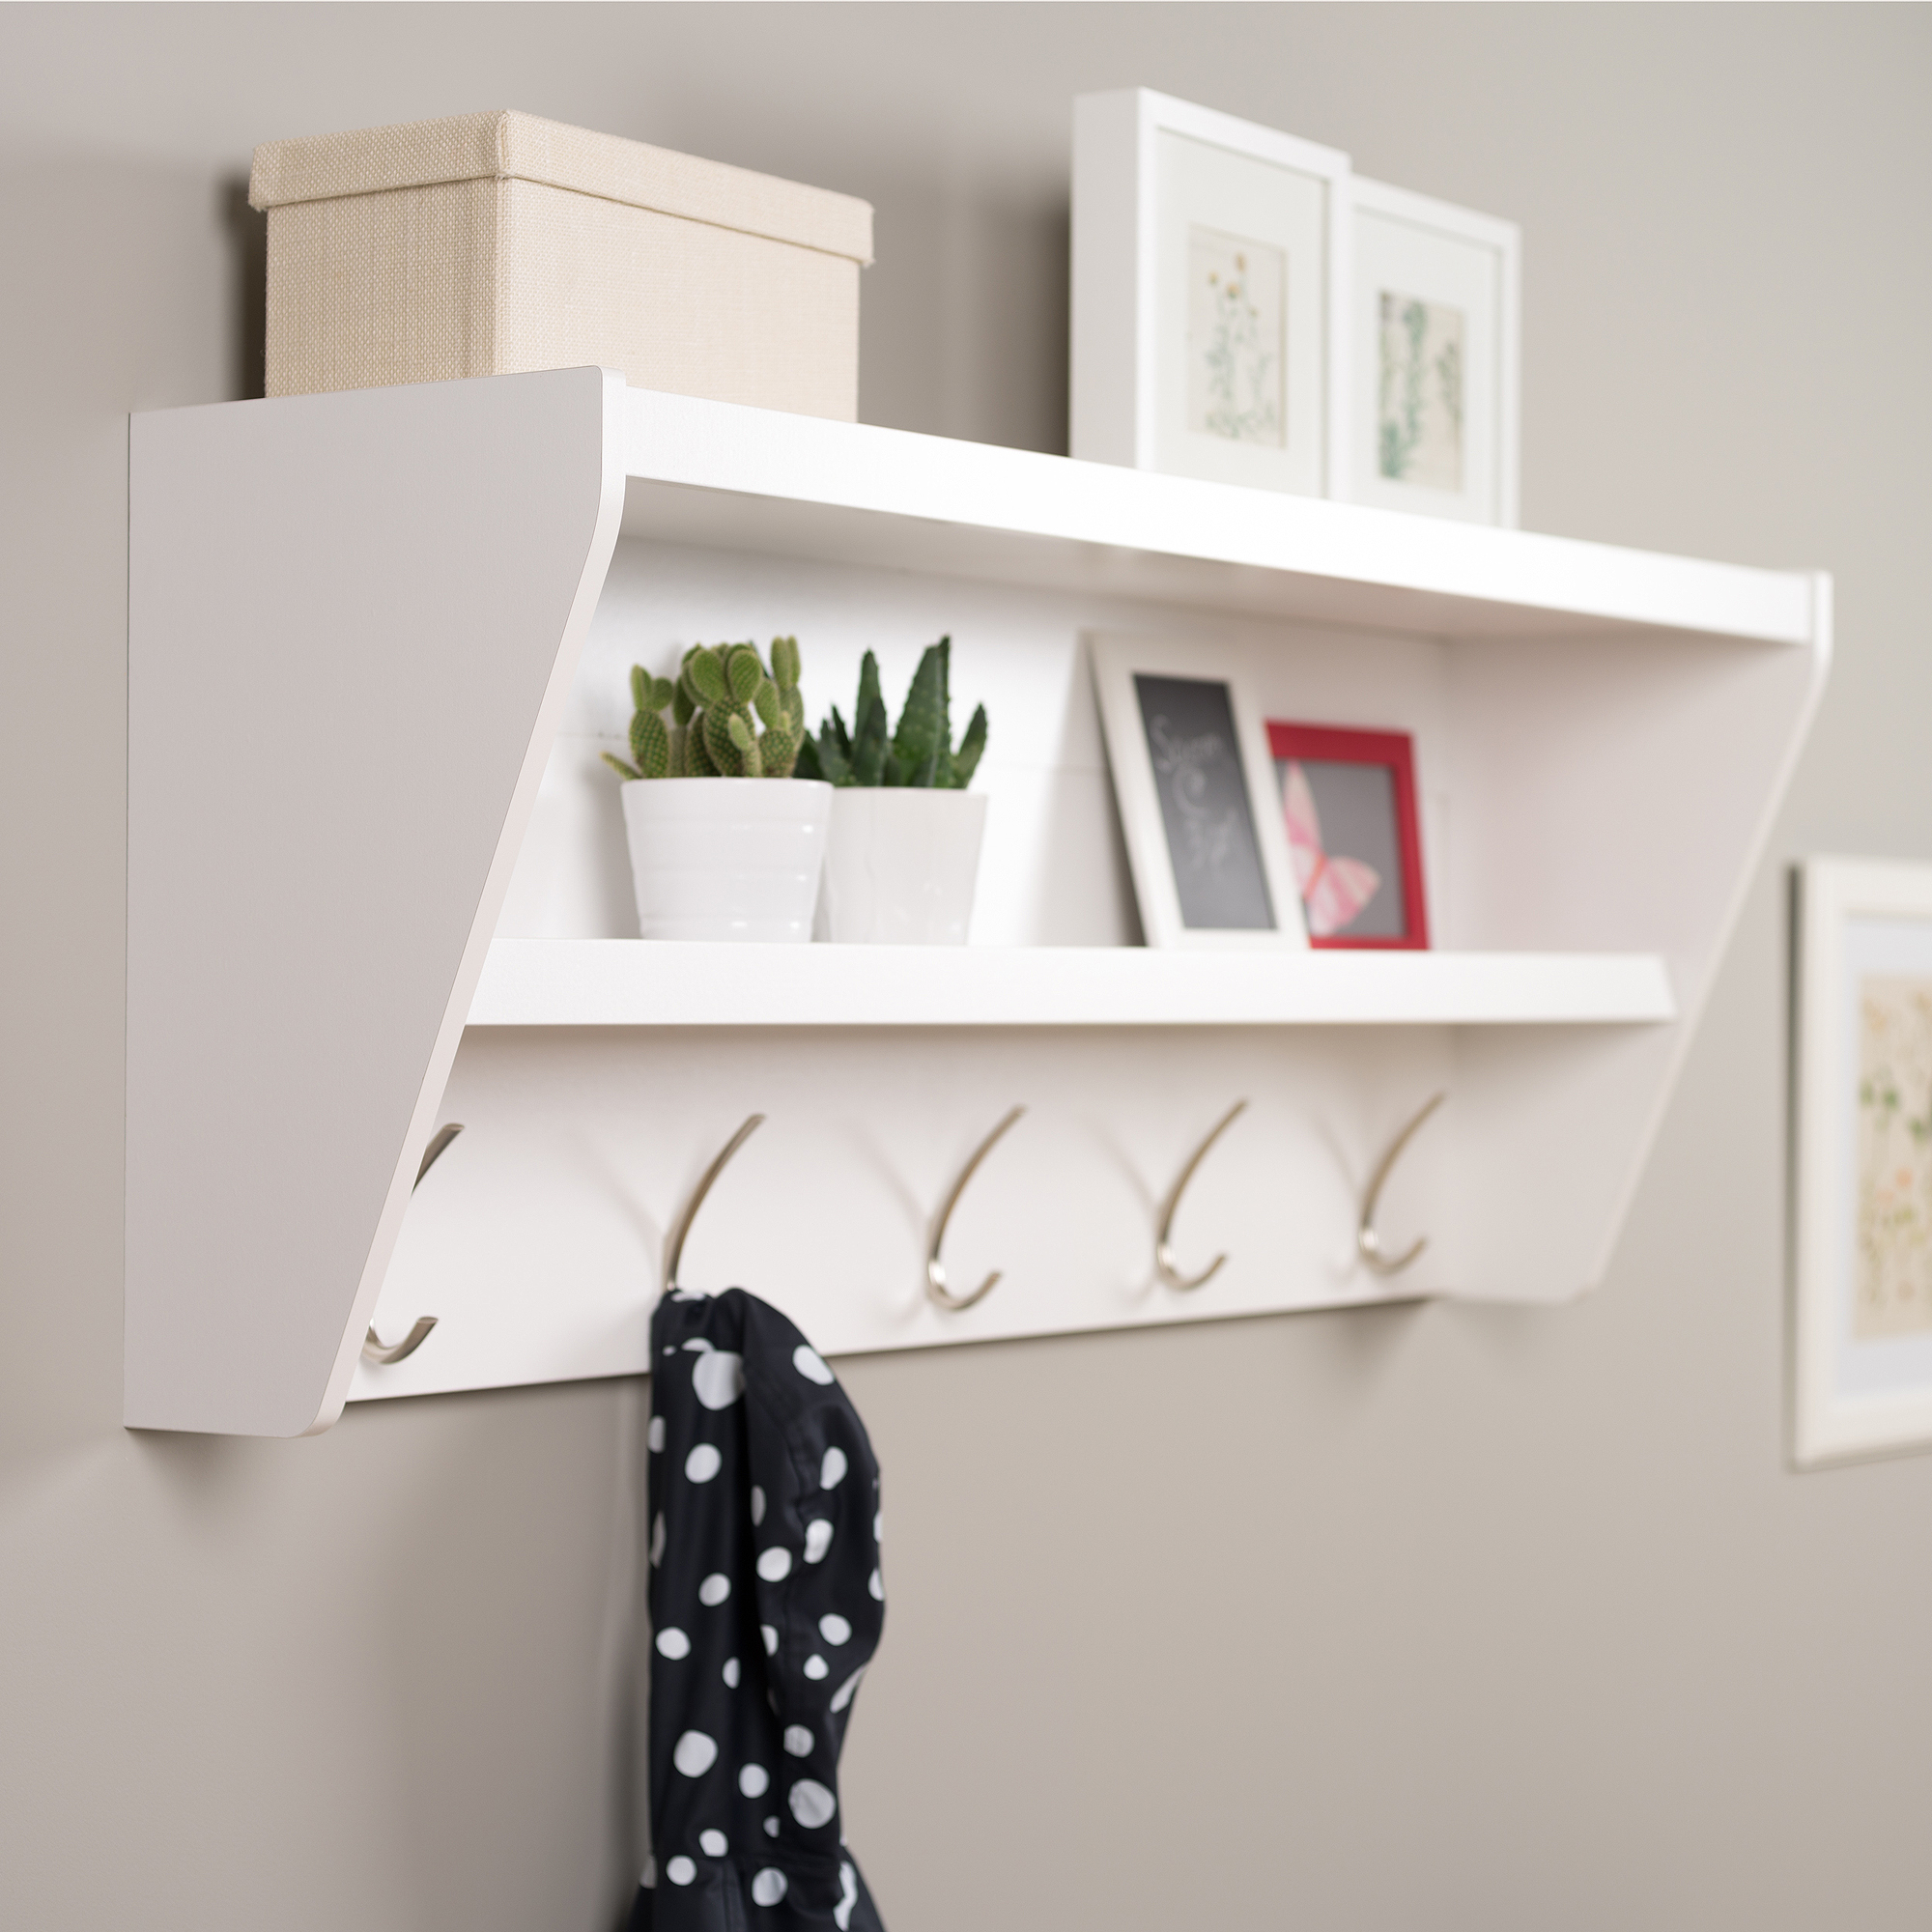 shelf and coat rack ideas on foter